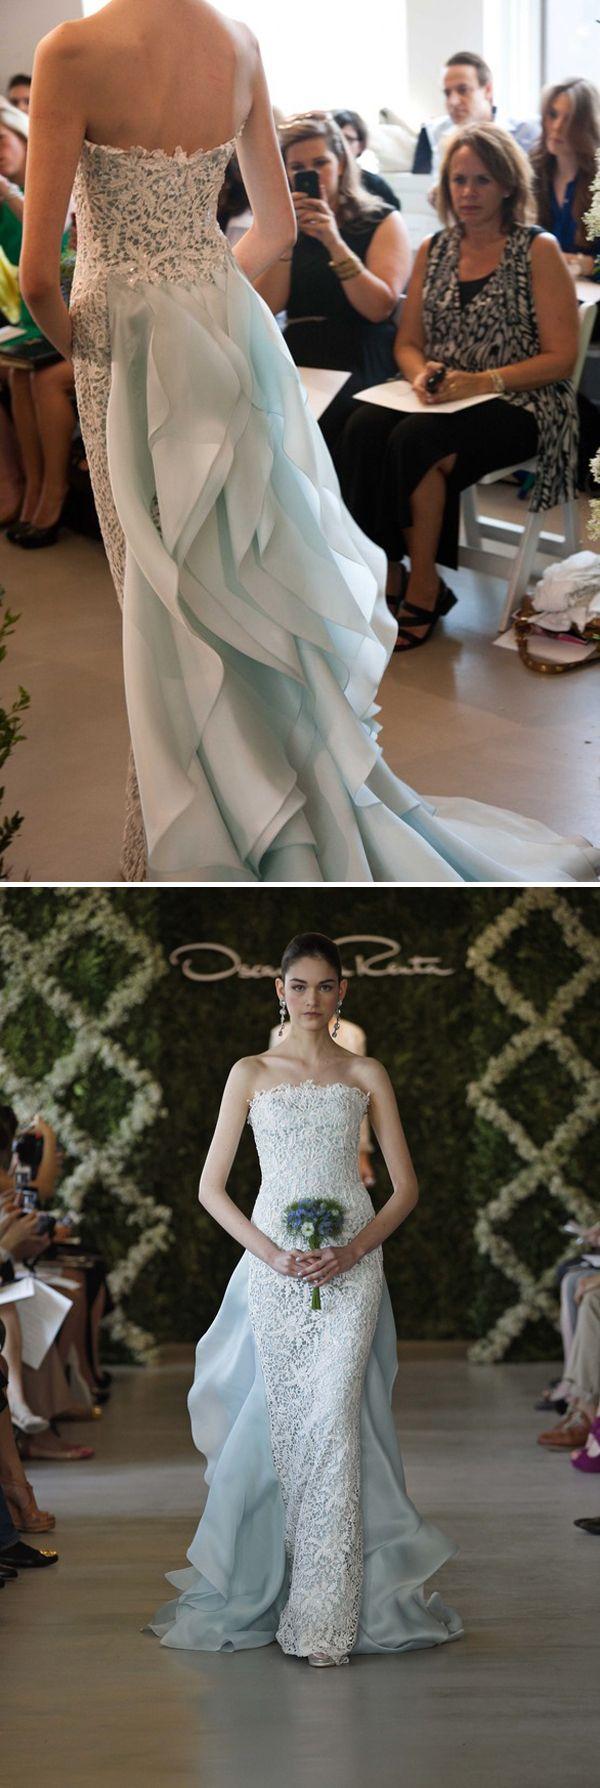 Oscar de la Renta wedding dress. What a stunna.